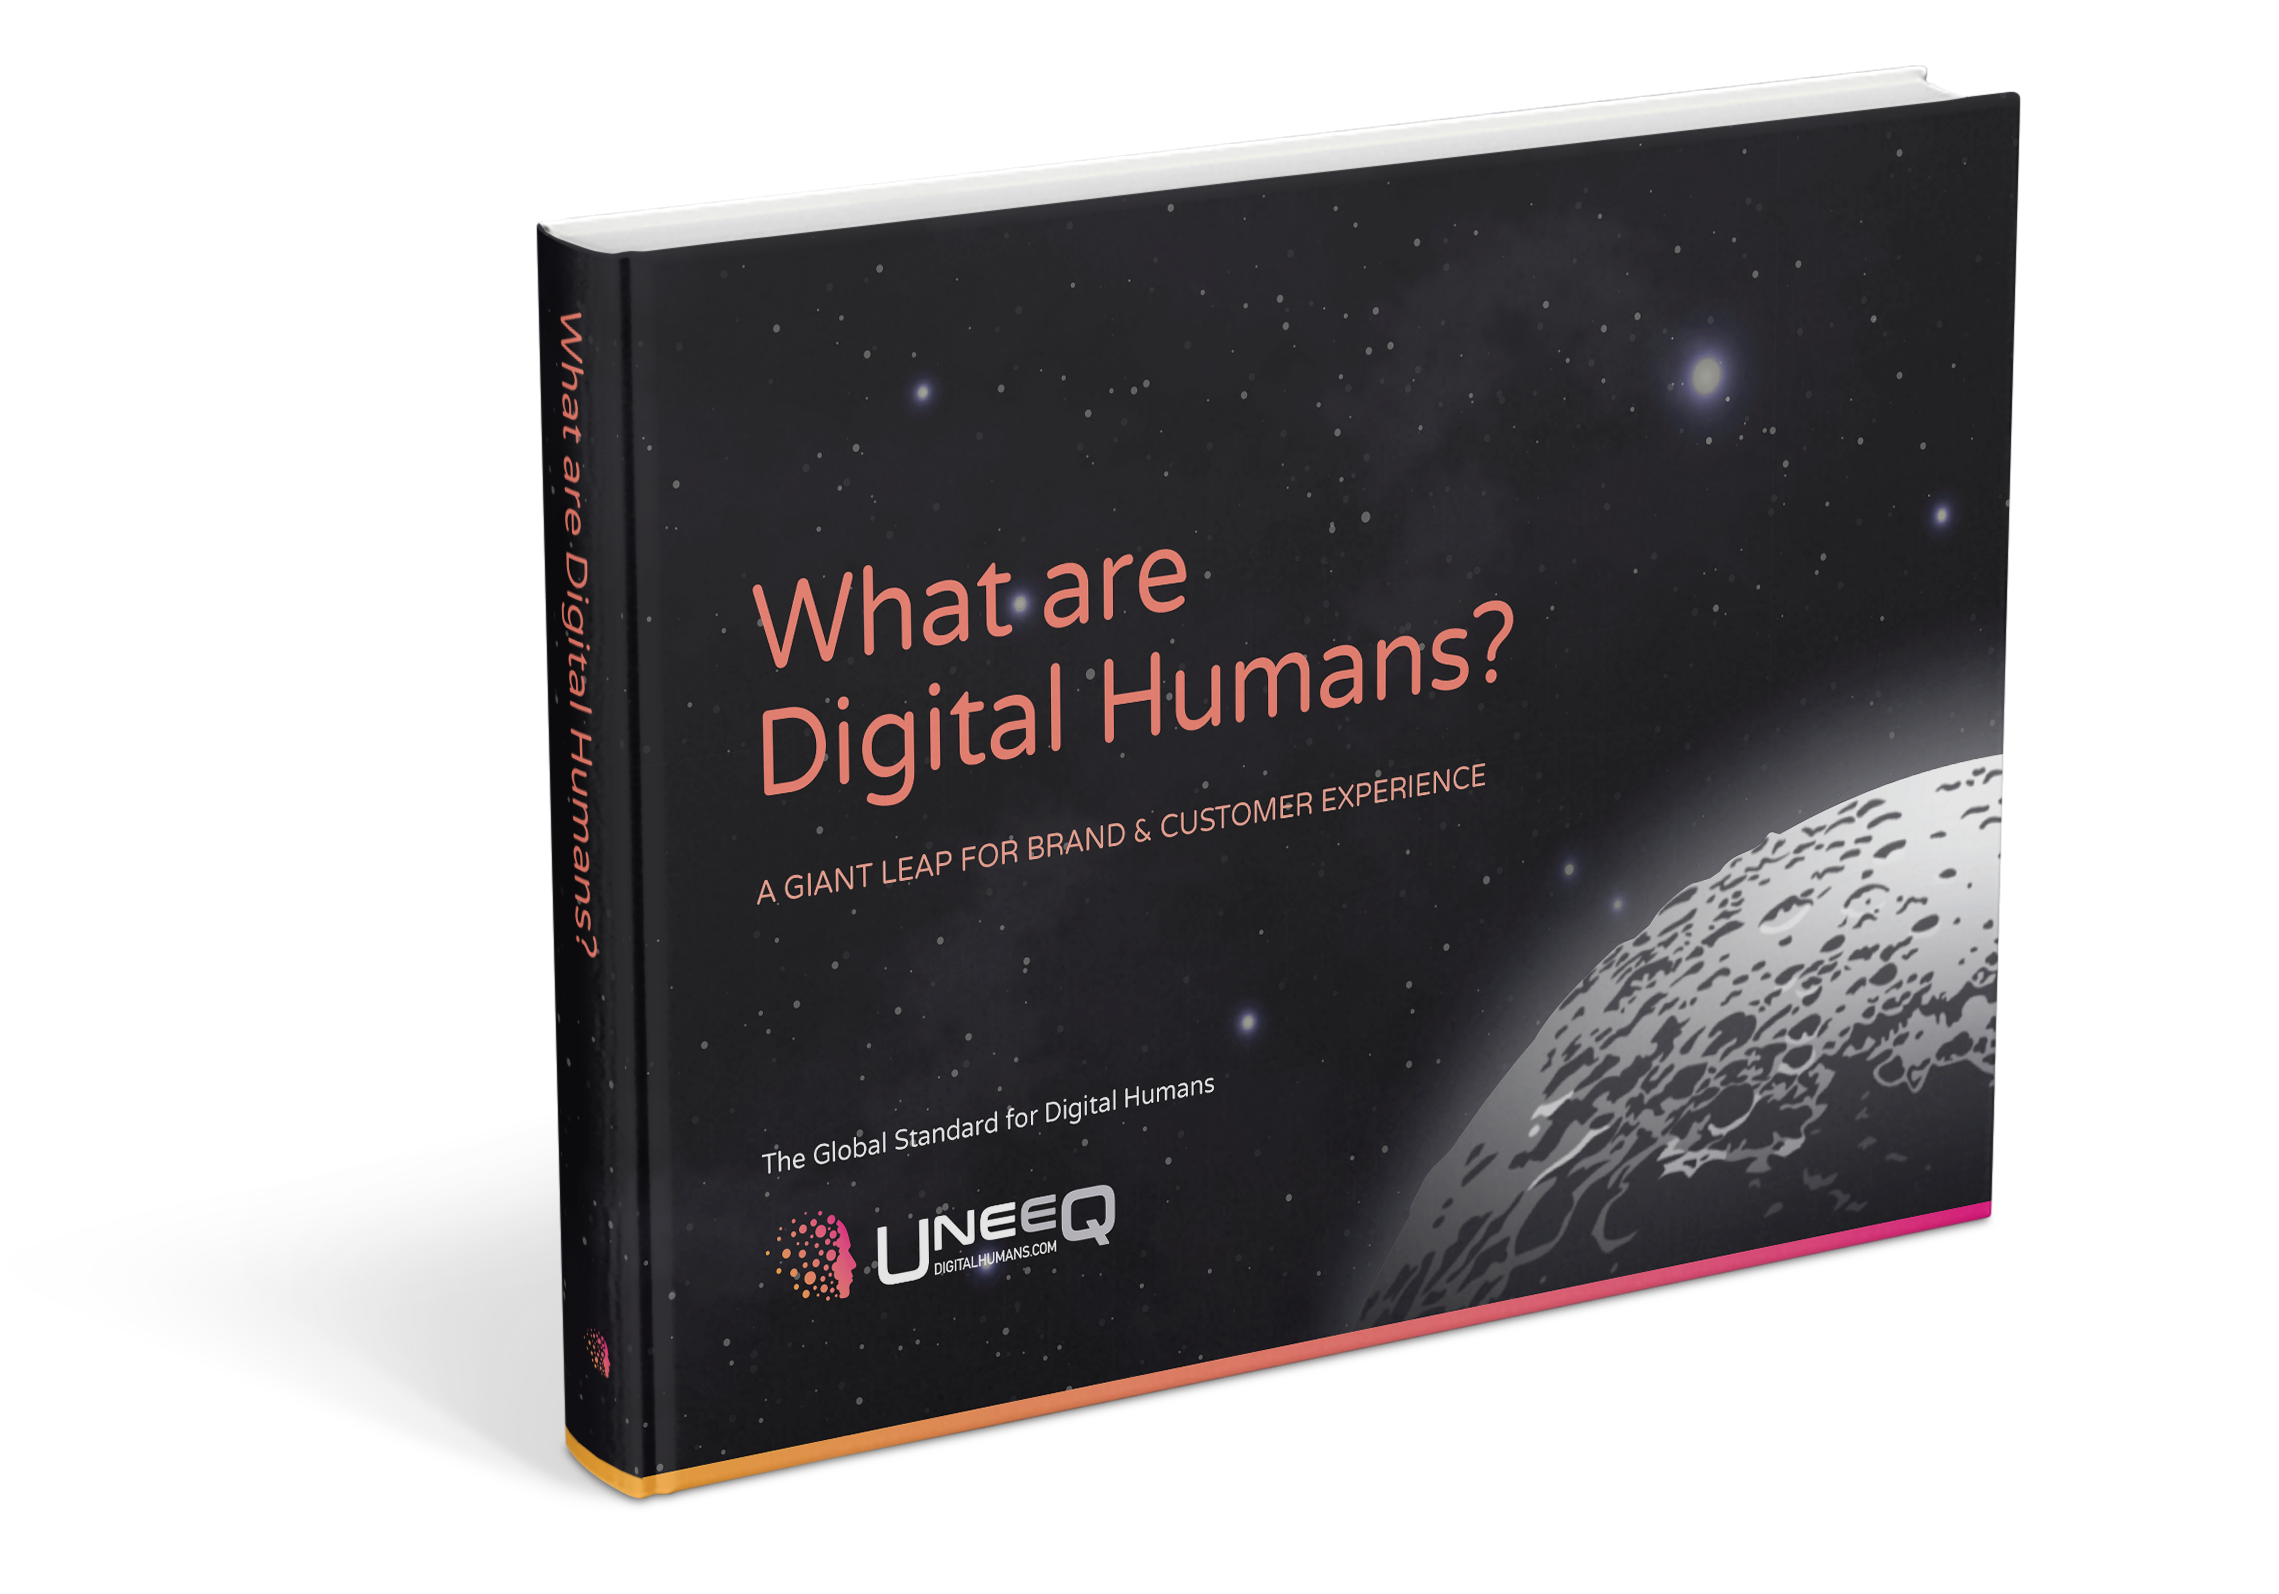 FME1025-Digital-Humans-eBook-Cover-